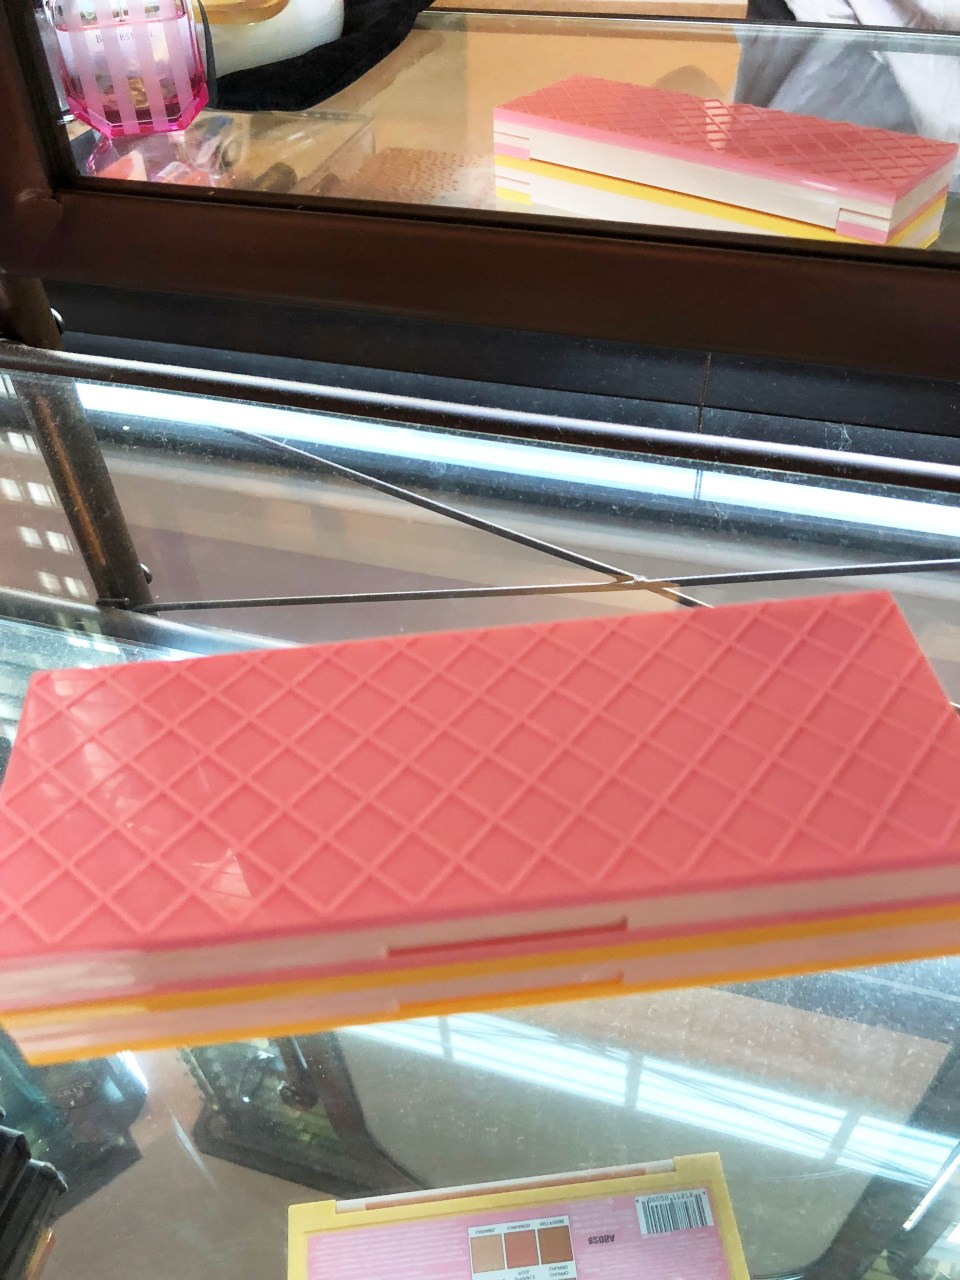 Museum of Ice Cream x Sephora - Sugar Wafer Palette